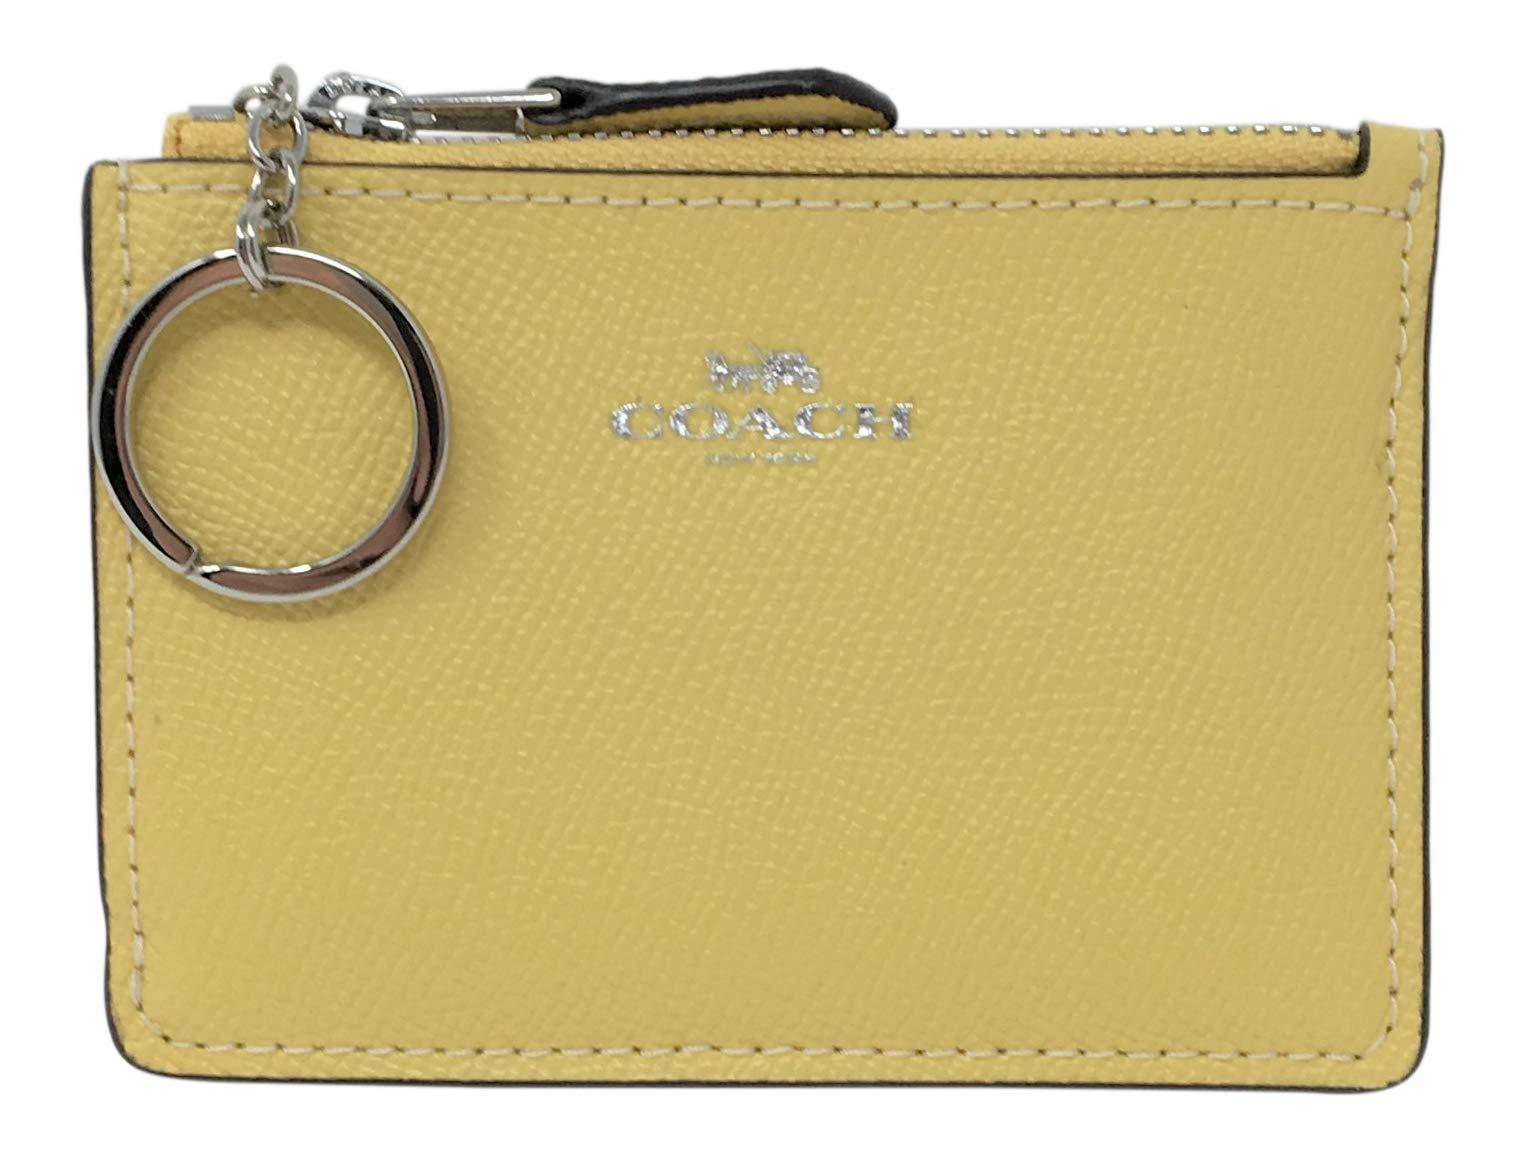 Coach F12186 Mini Skinny ID Case In Crossgrain Leather Light Yellow